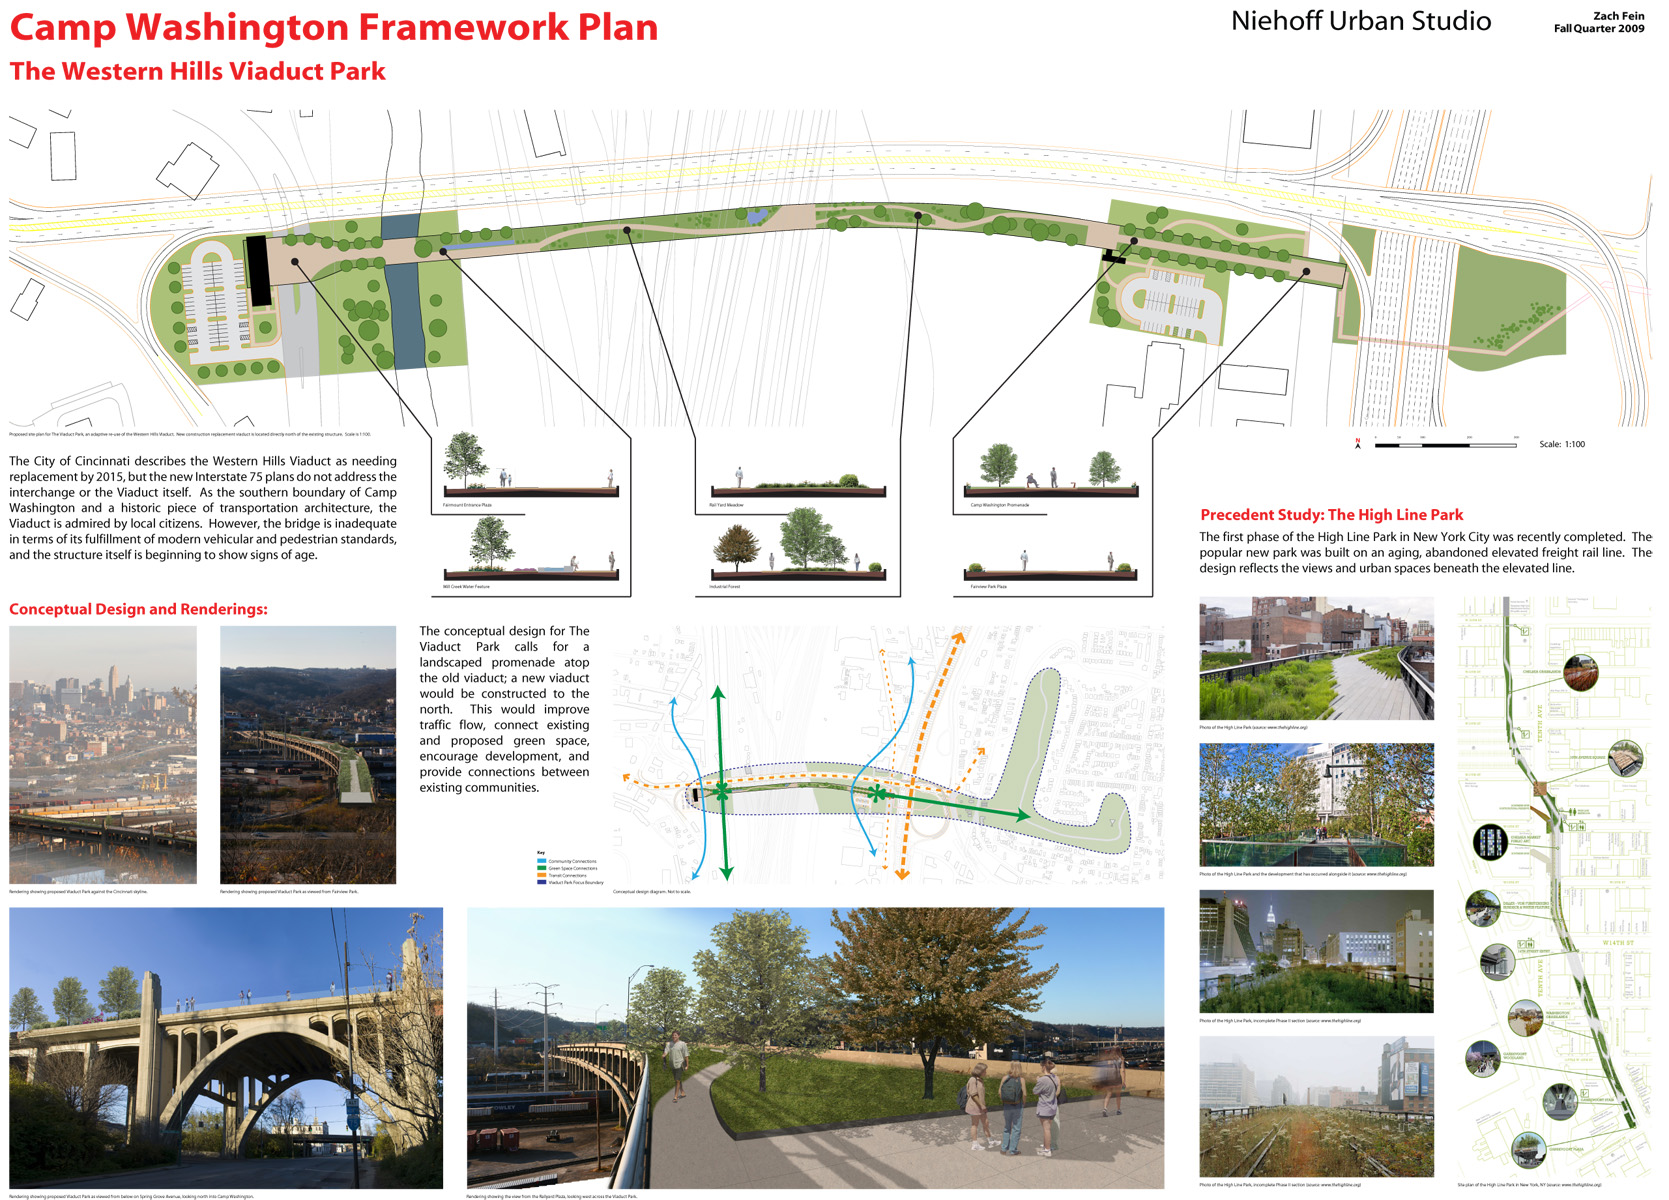 Dissertation proposal architecture